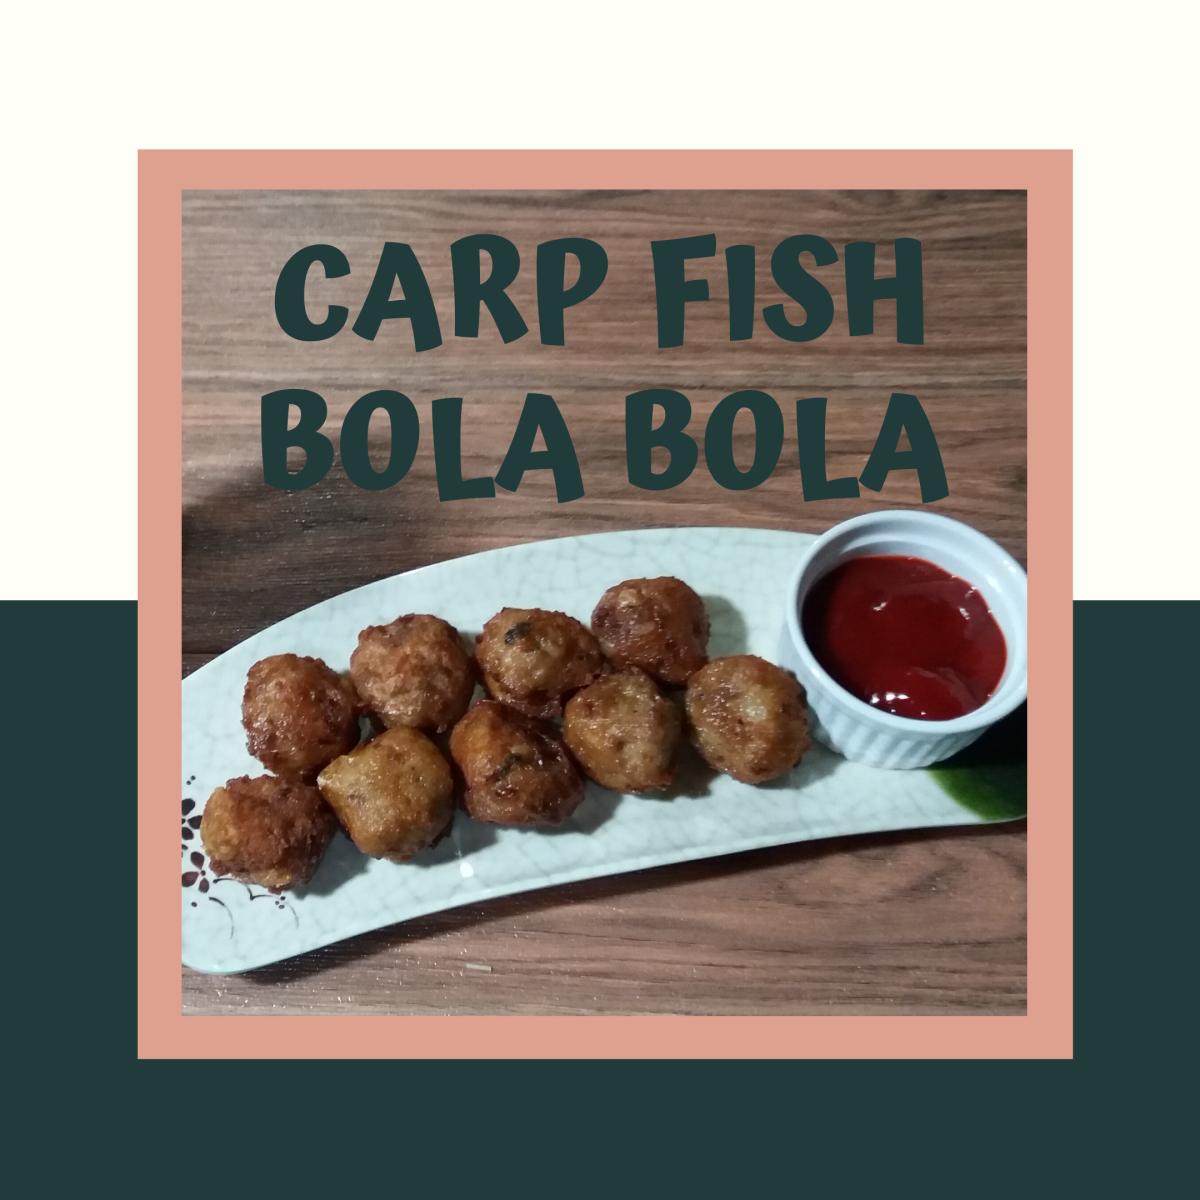 How to Cook Filipino-Style Carp Fish Bola Bola